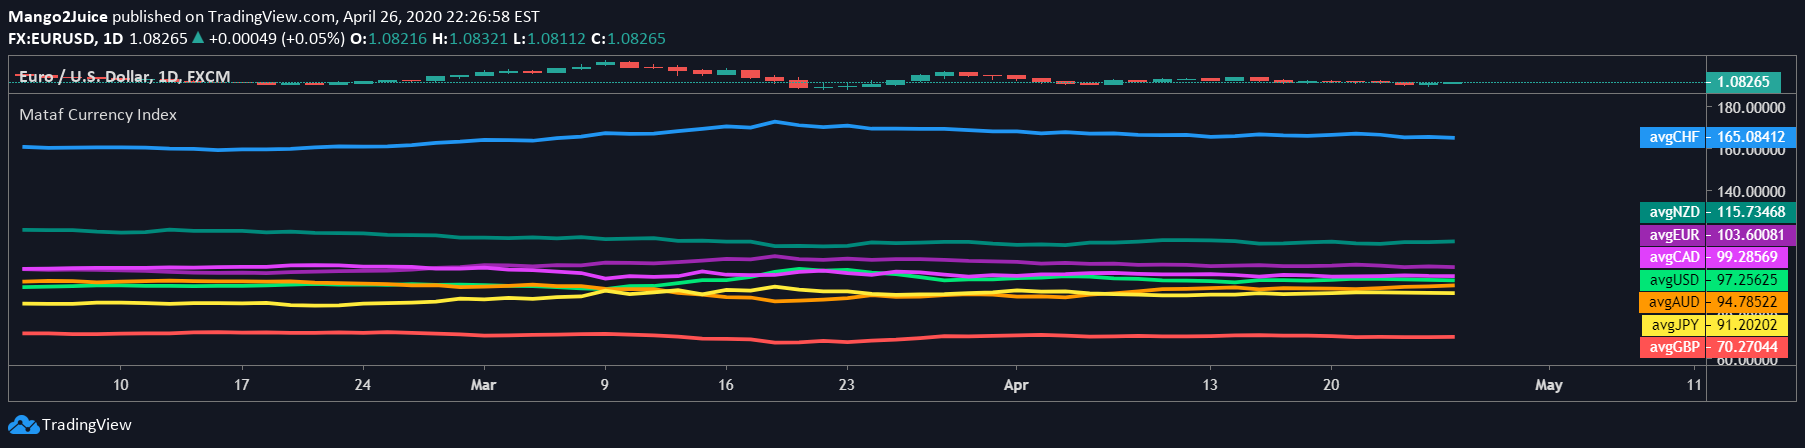 Mataf forex volatility indicator remraam location dubai investment